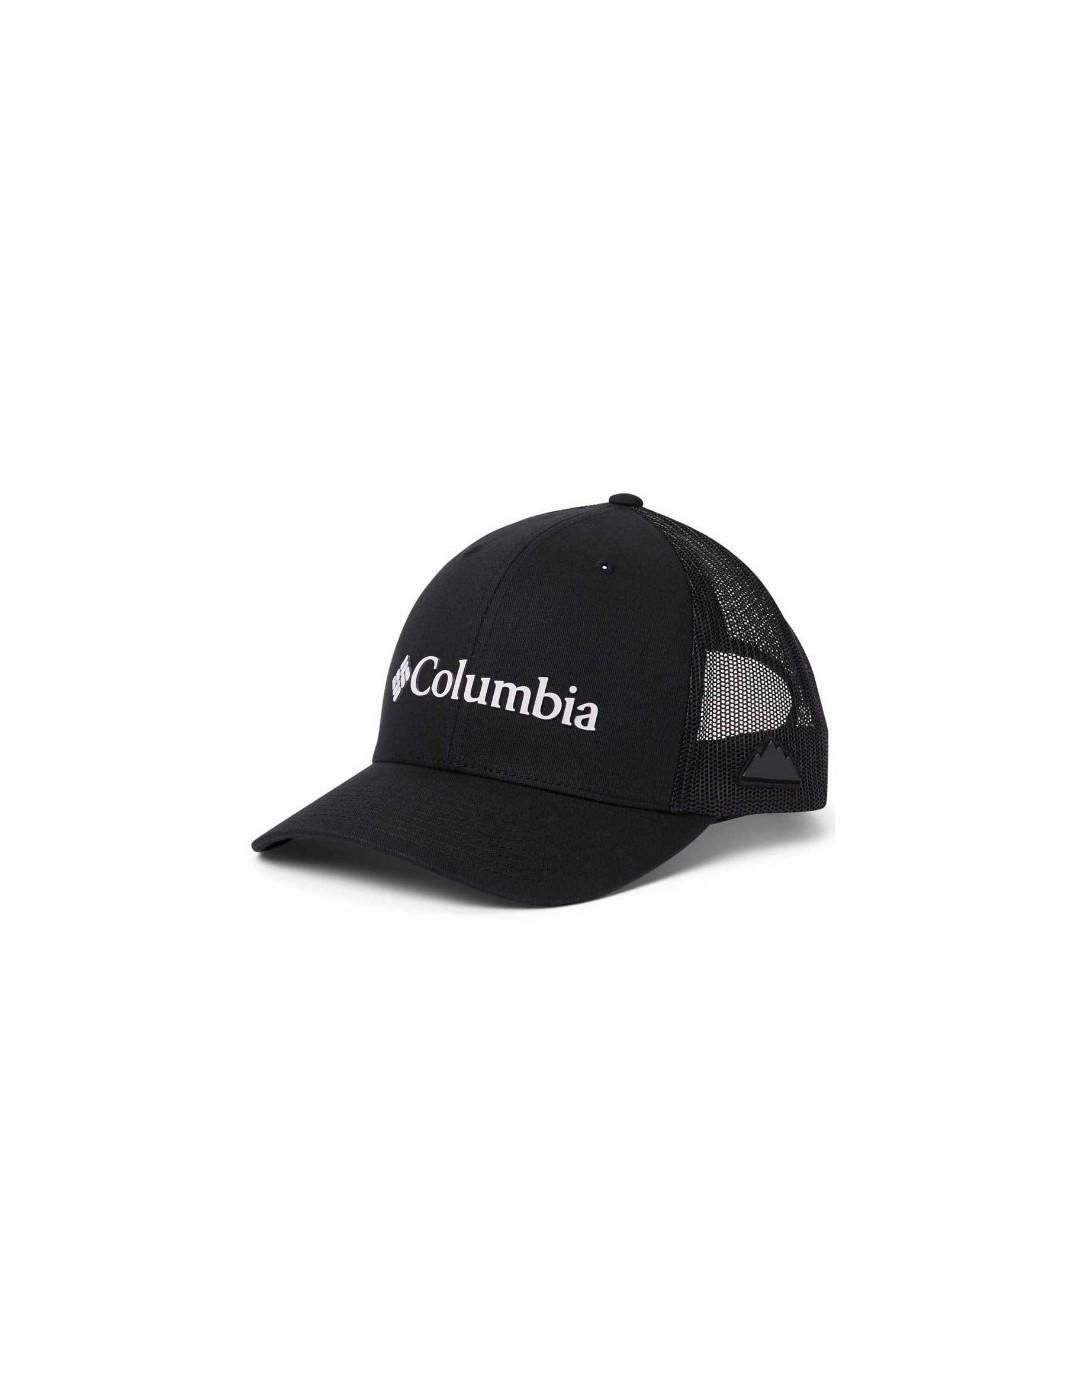 GORRA COLUMBIA MESH SNAP BACK BLACK